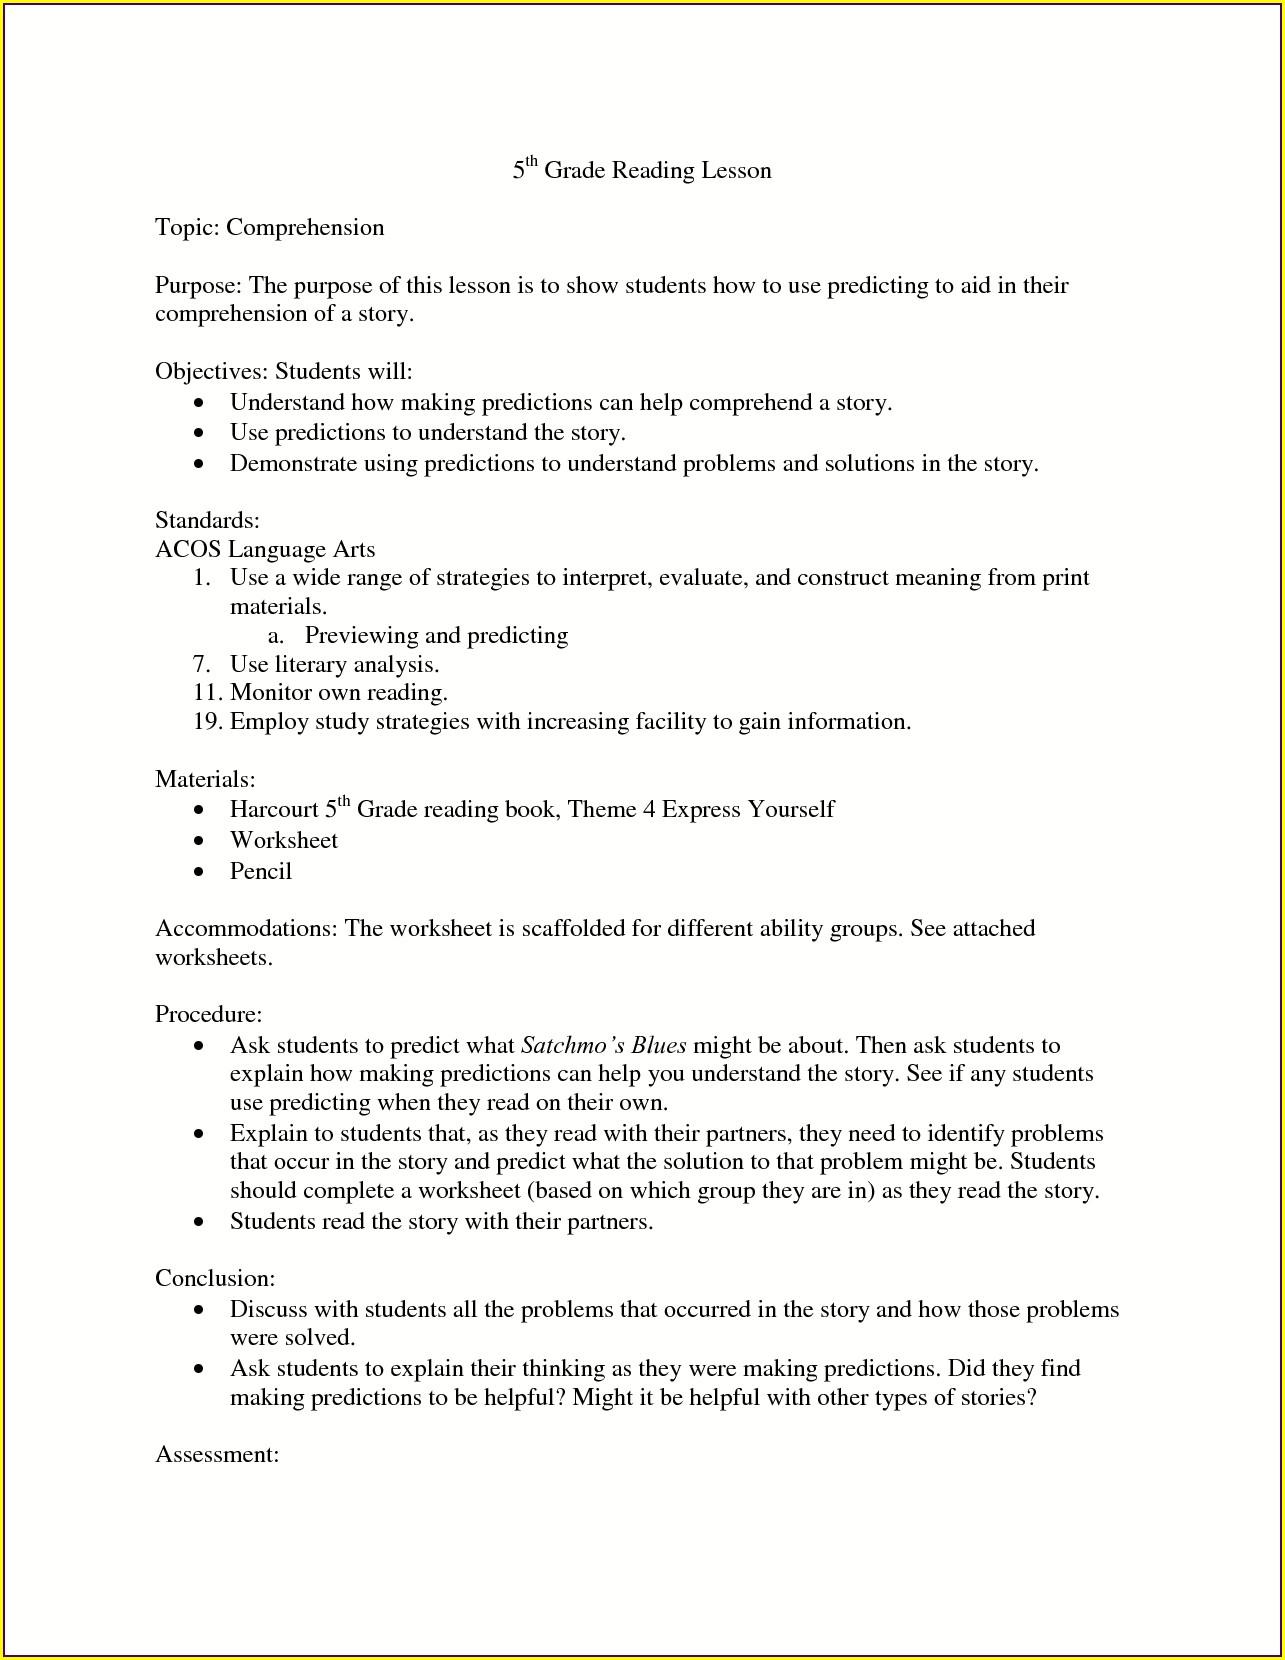 5th Grade Worksheets For Language Arts